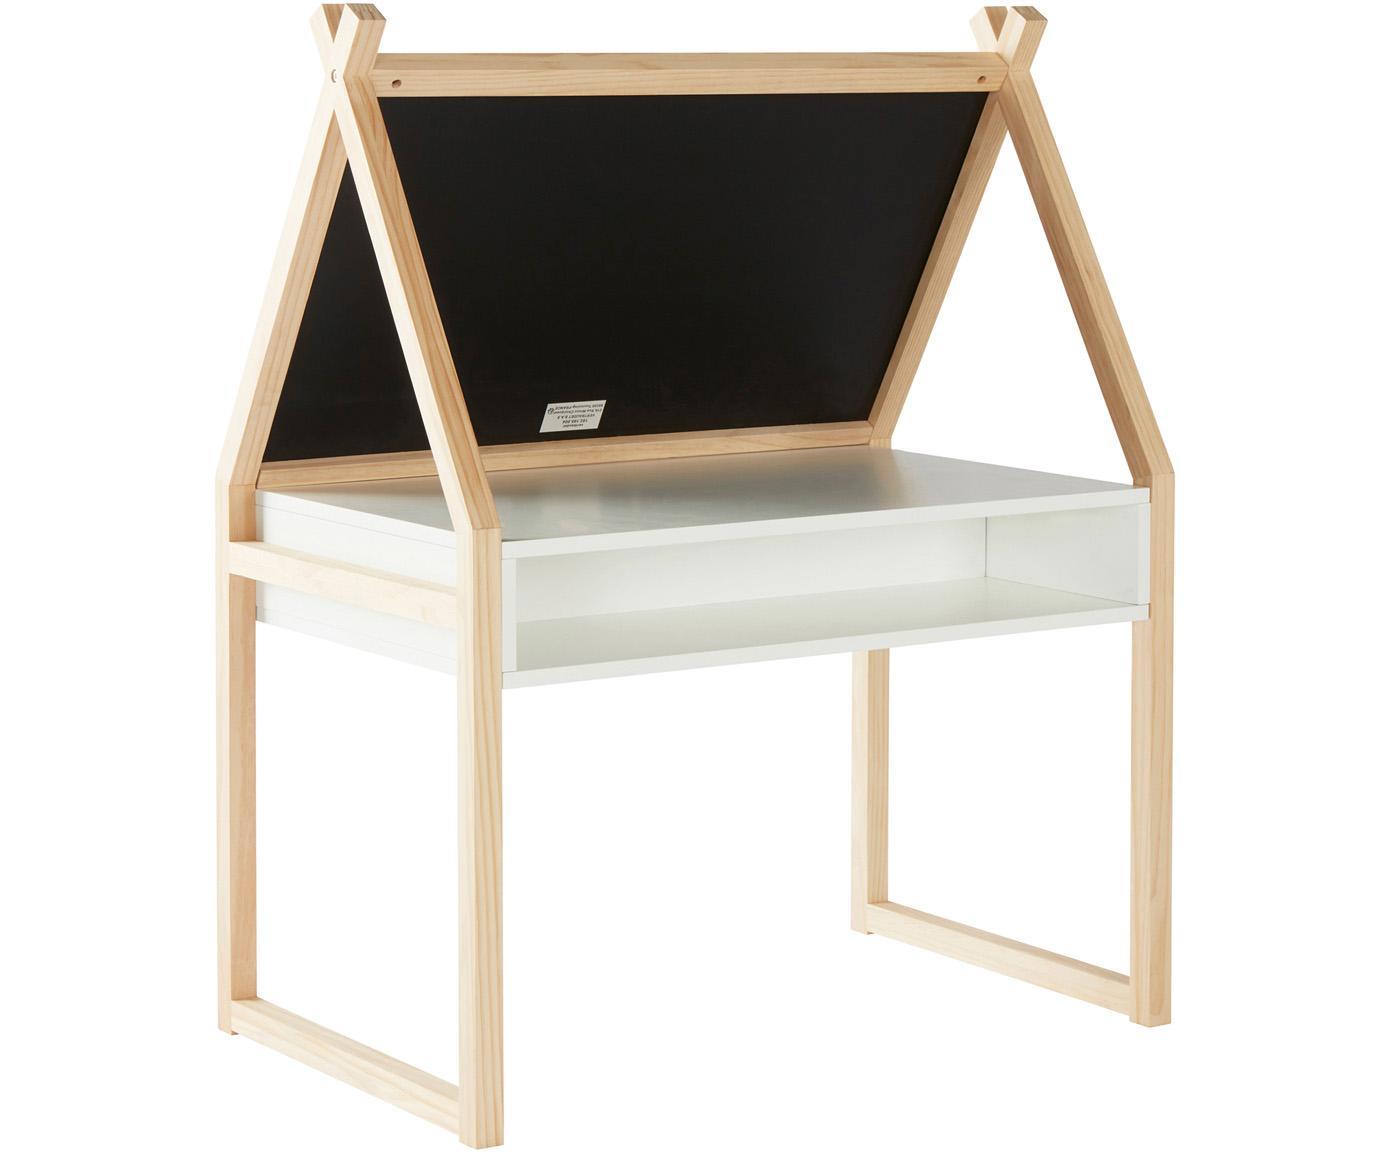 Kindertafel Cadiz met krijtbord, Frame: grenenhout, Bruin, wit, zwart, 80 x 101 cm